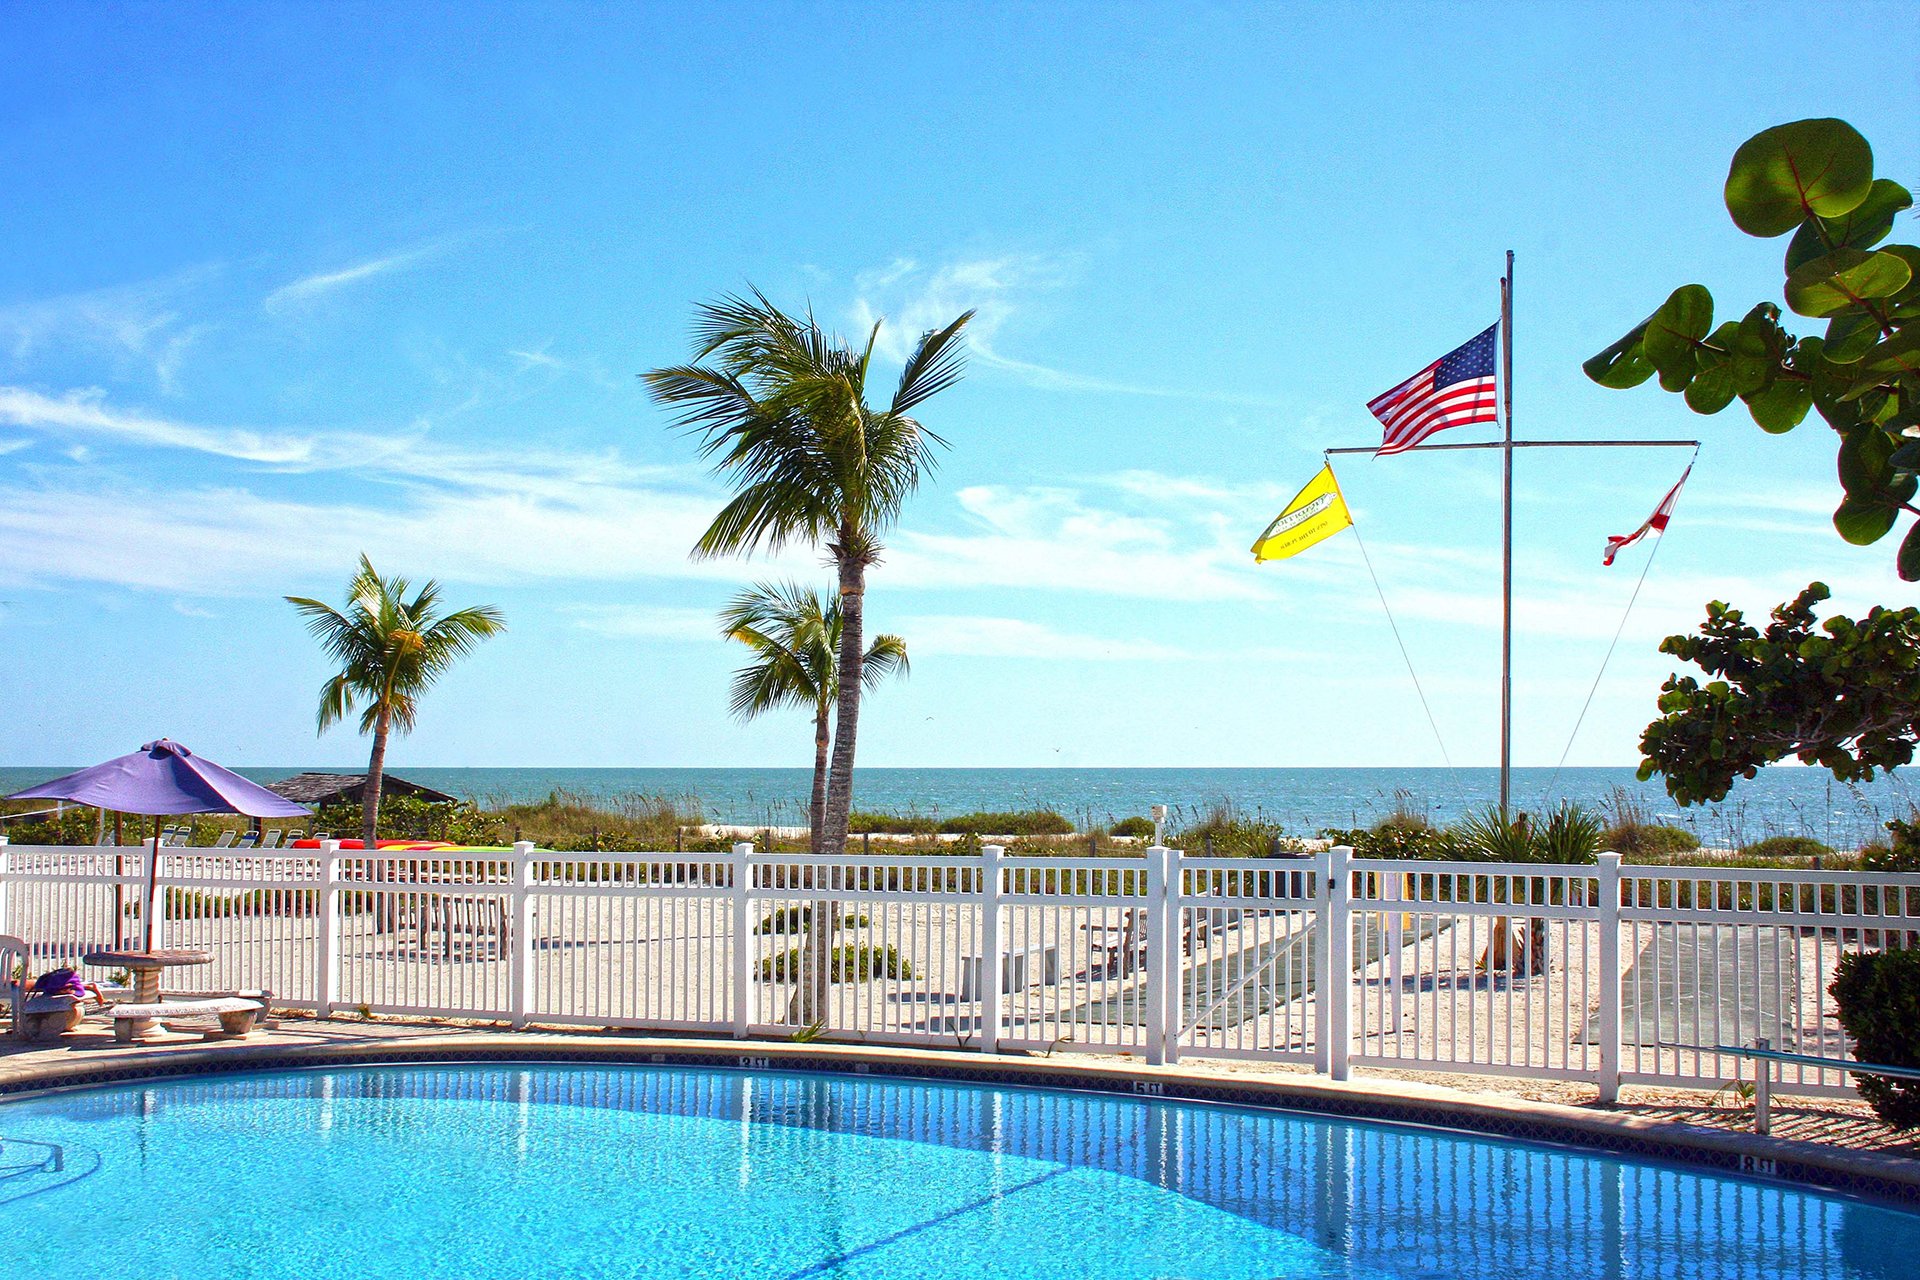 Island Inn in Sanibel Island, Florida